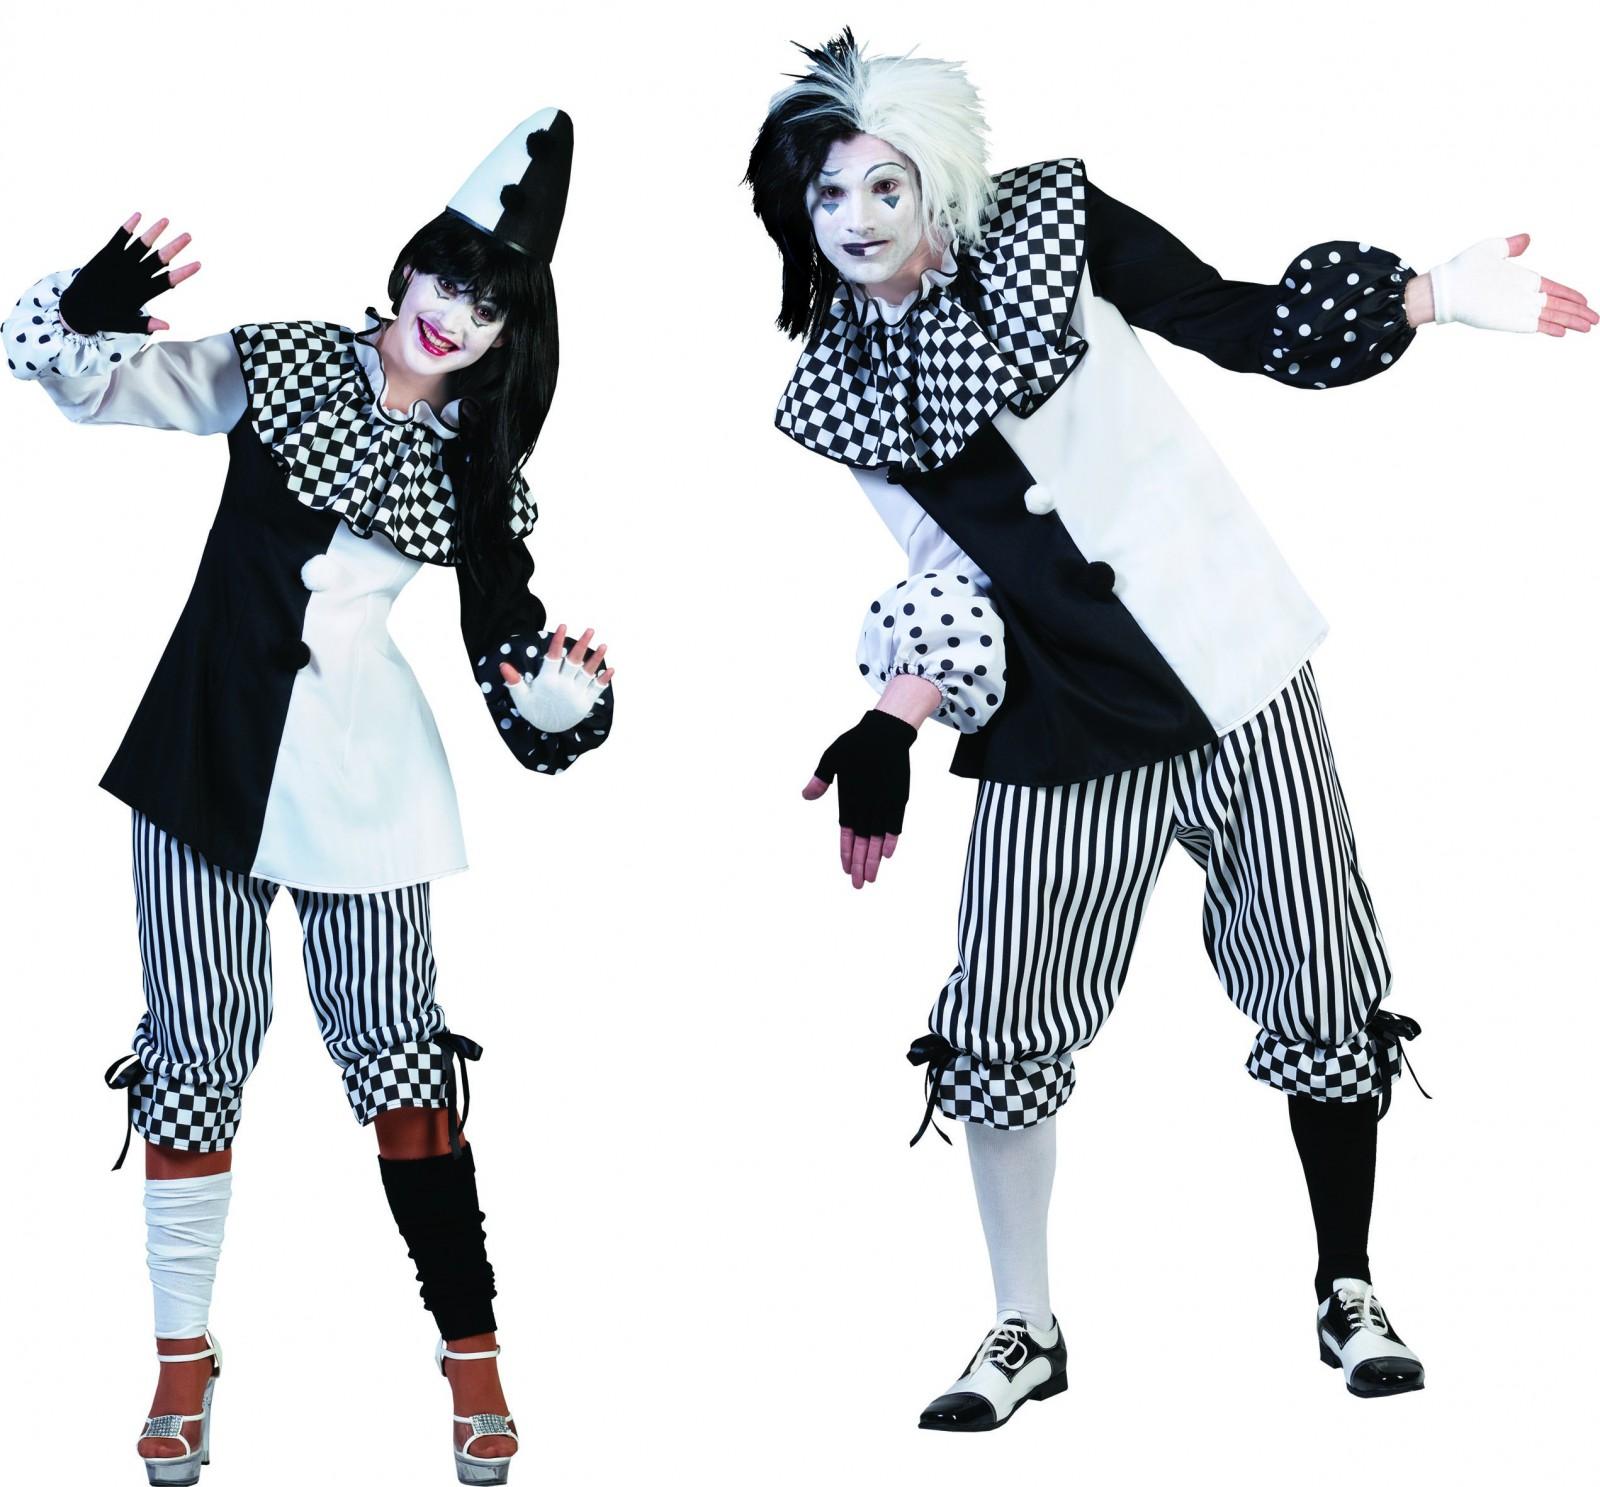 Kostum Pierrot Harlekin Clown Pantomime Damen Herren Fasching